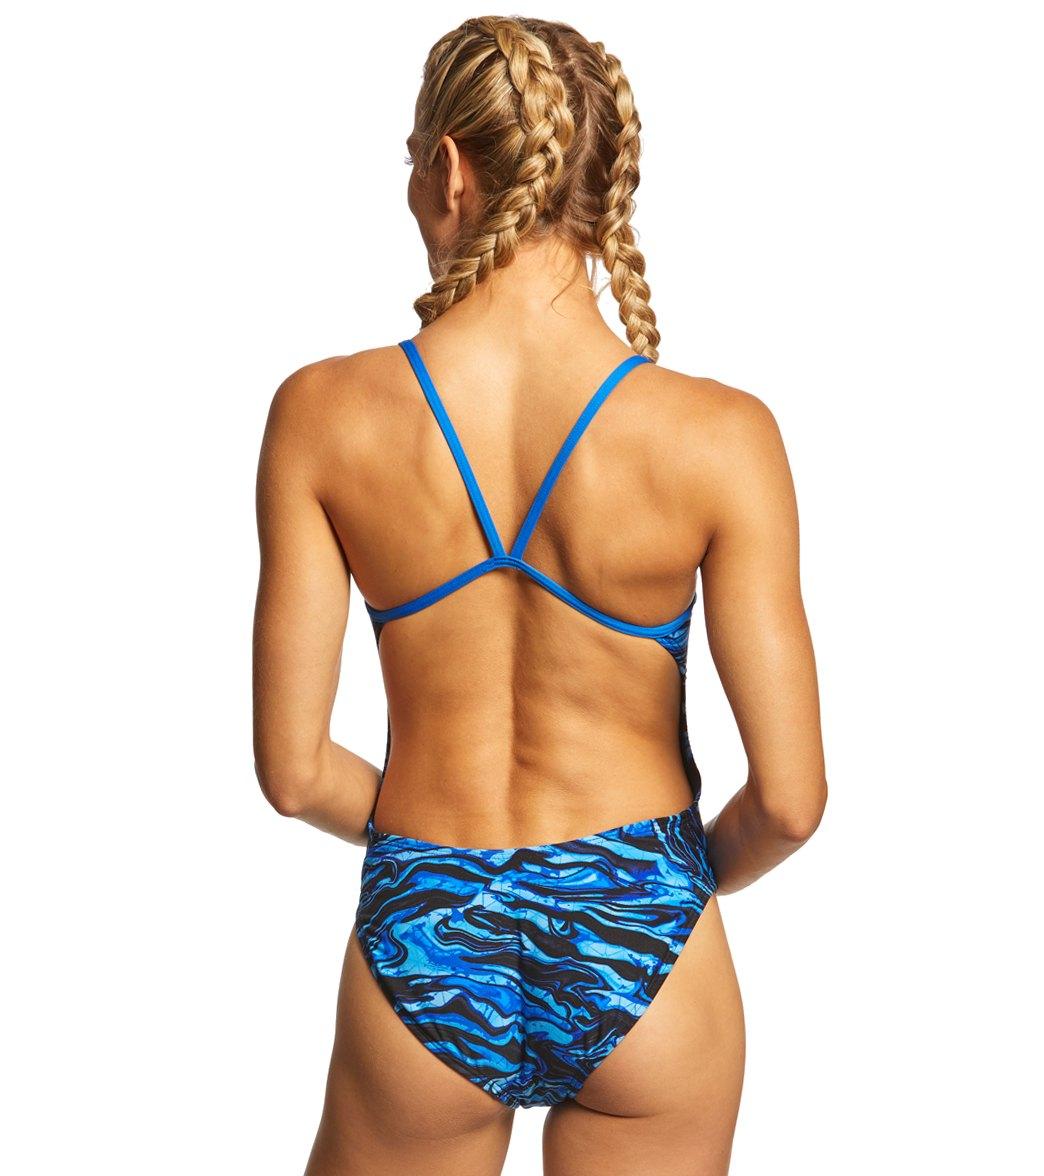 dfa0174b47 TYR Women's Miramar Cutoutfit One Piece Swimsuit at SwimOutlet.com ...